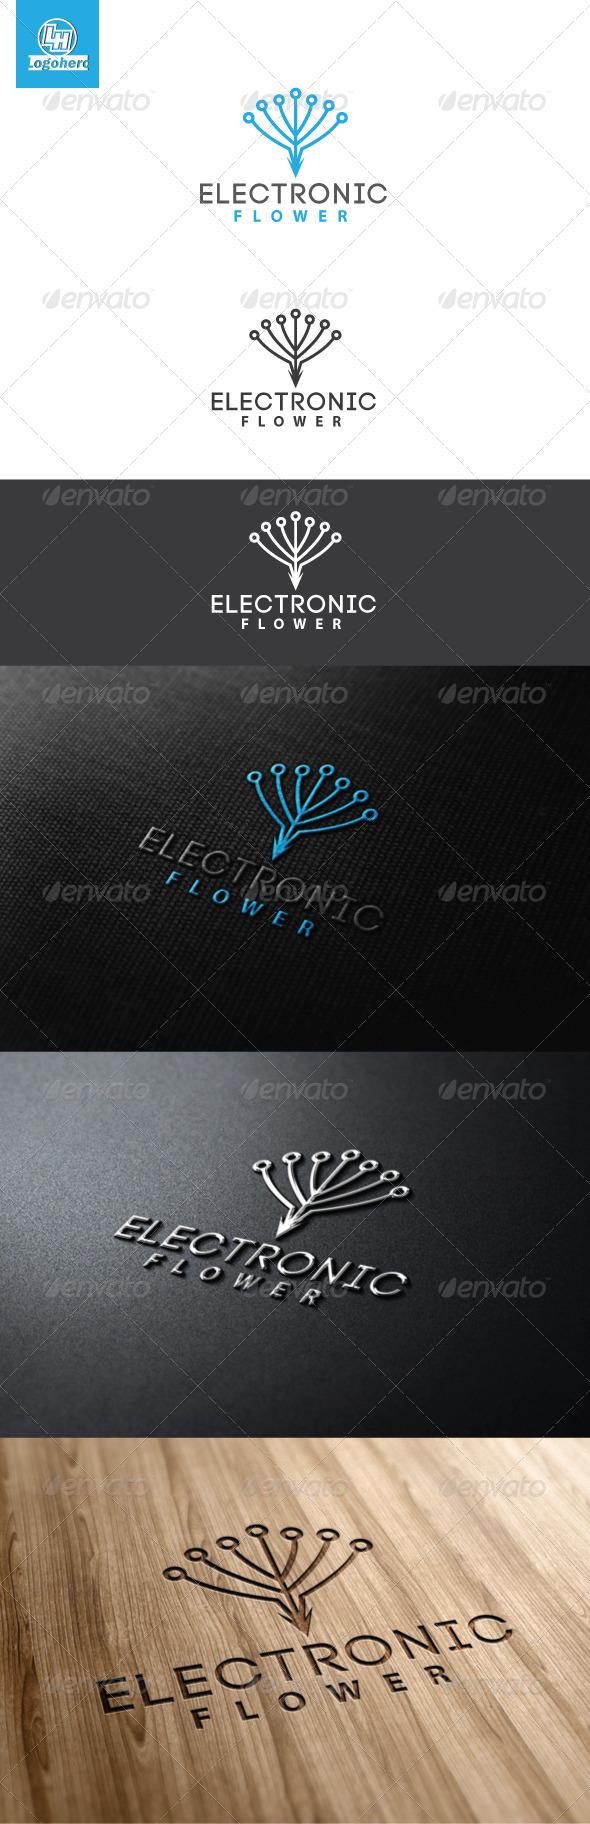 Electronic Flower Logo Template - Symbols Logo Templates